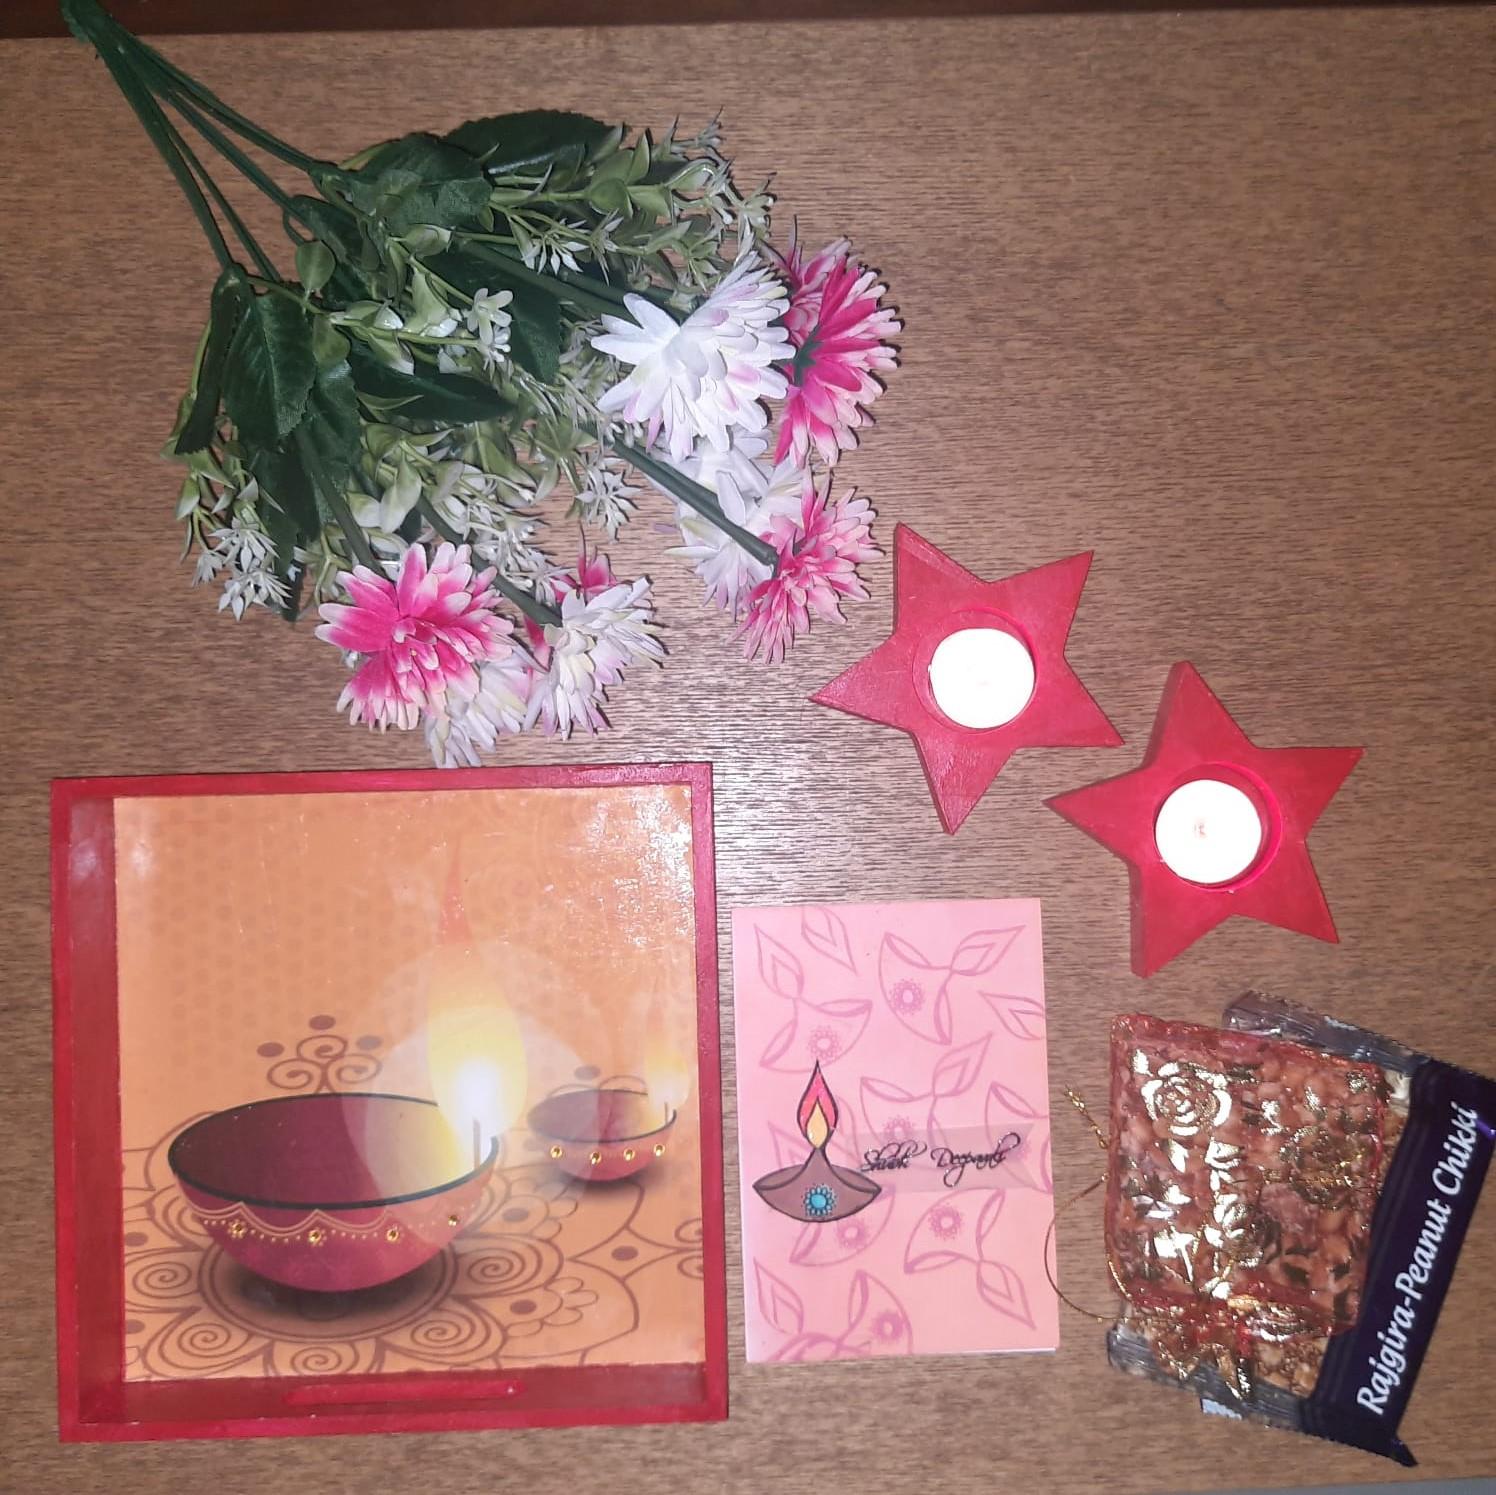 Diwali Hamper with Decoupage Tray, Tealights, Greeting Card, Chikkis Slider Thumbnail 1/4